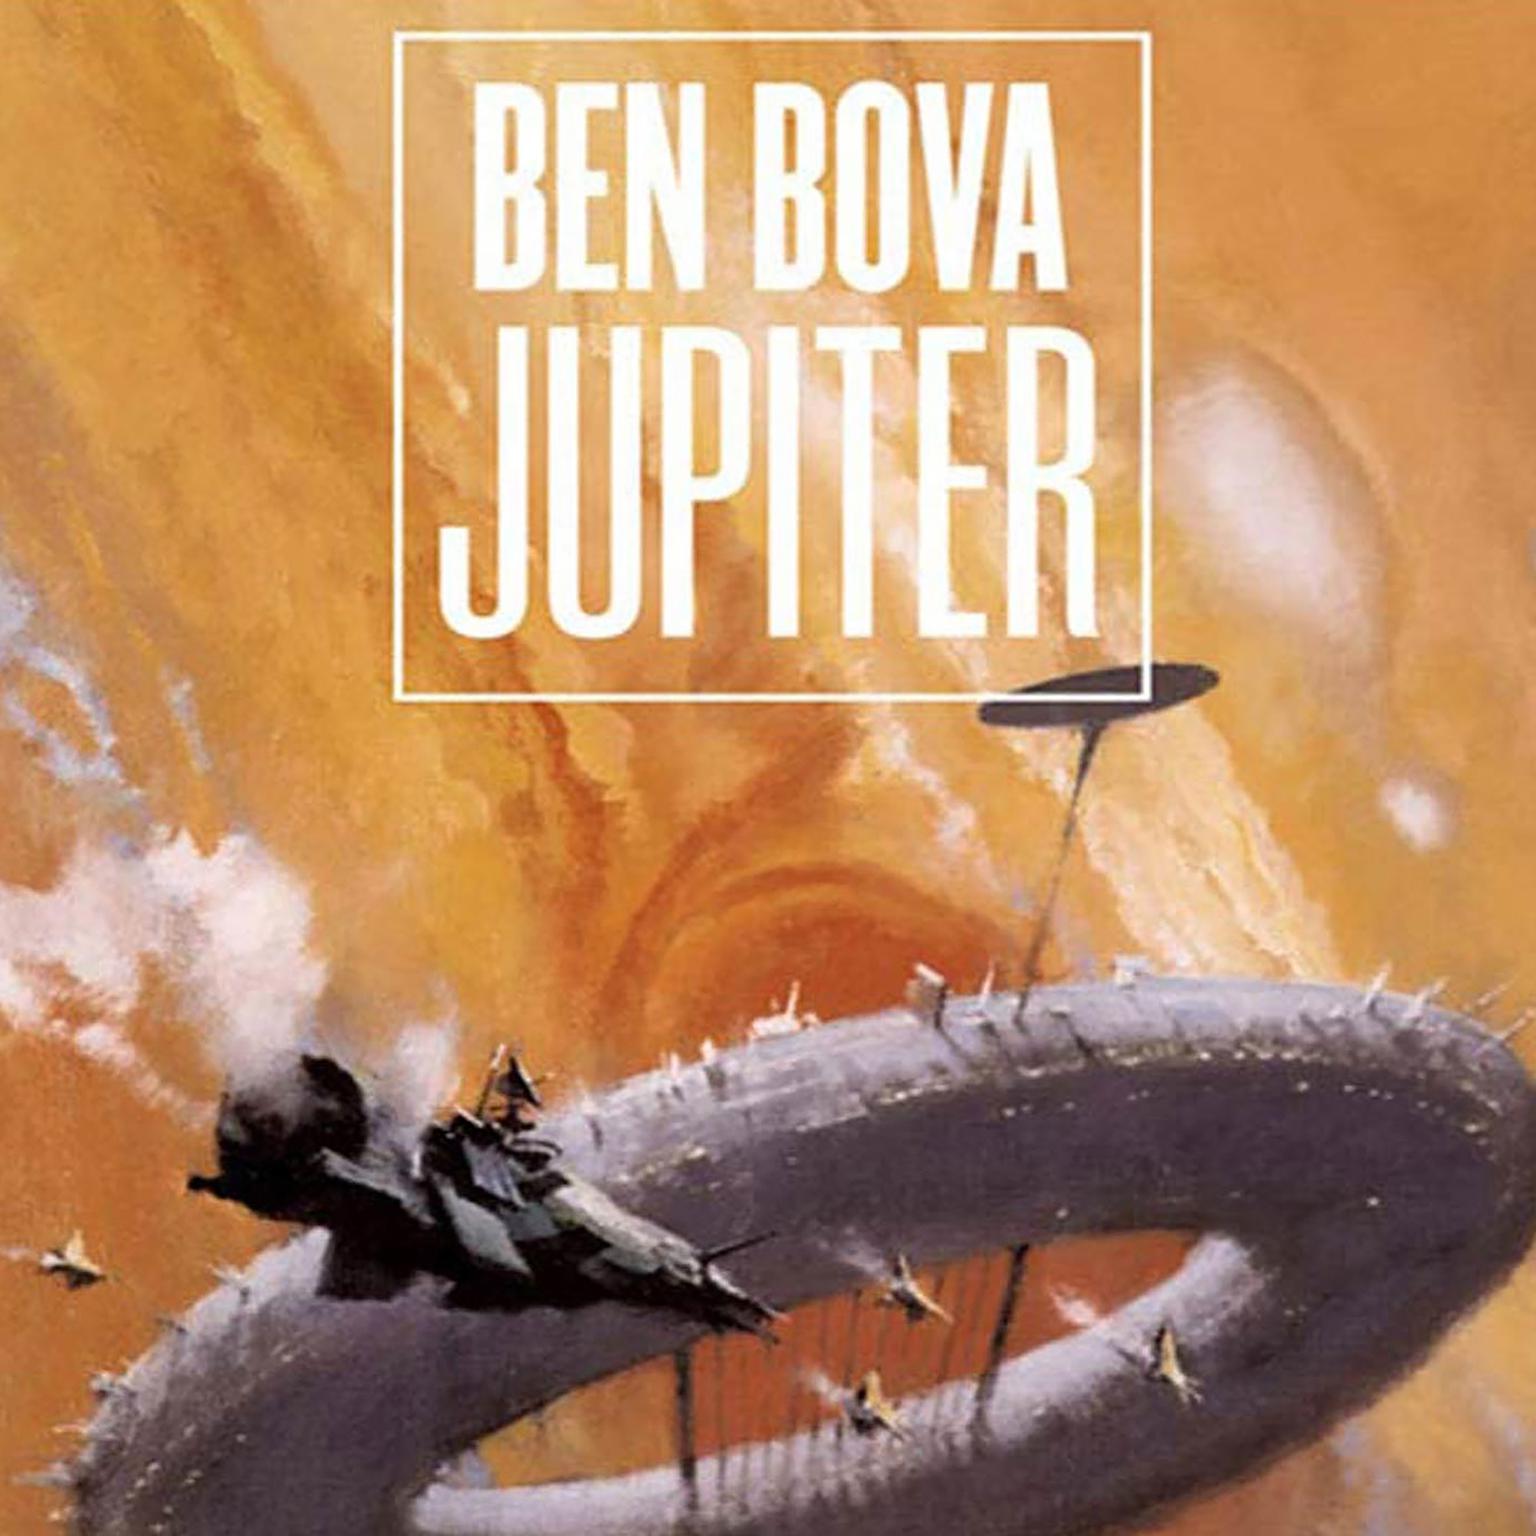 Printable Jupiter: A Novel Audiobook Cover Art